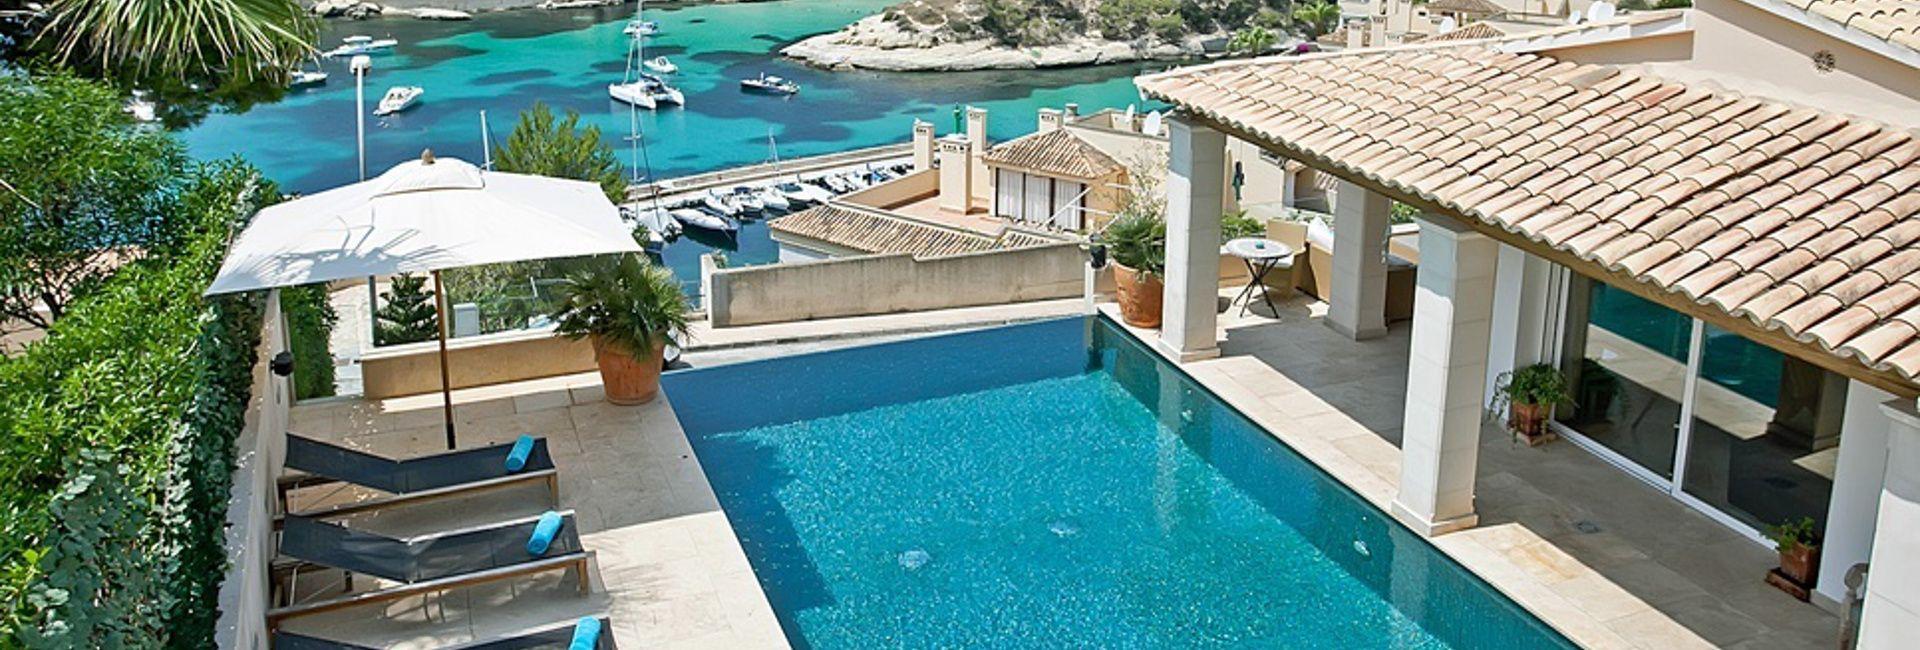 Haus Kaufen Mallorca El Toro